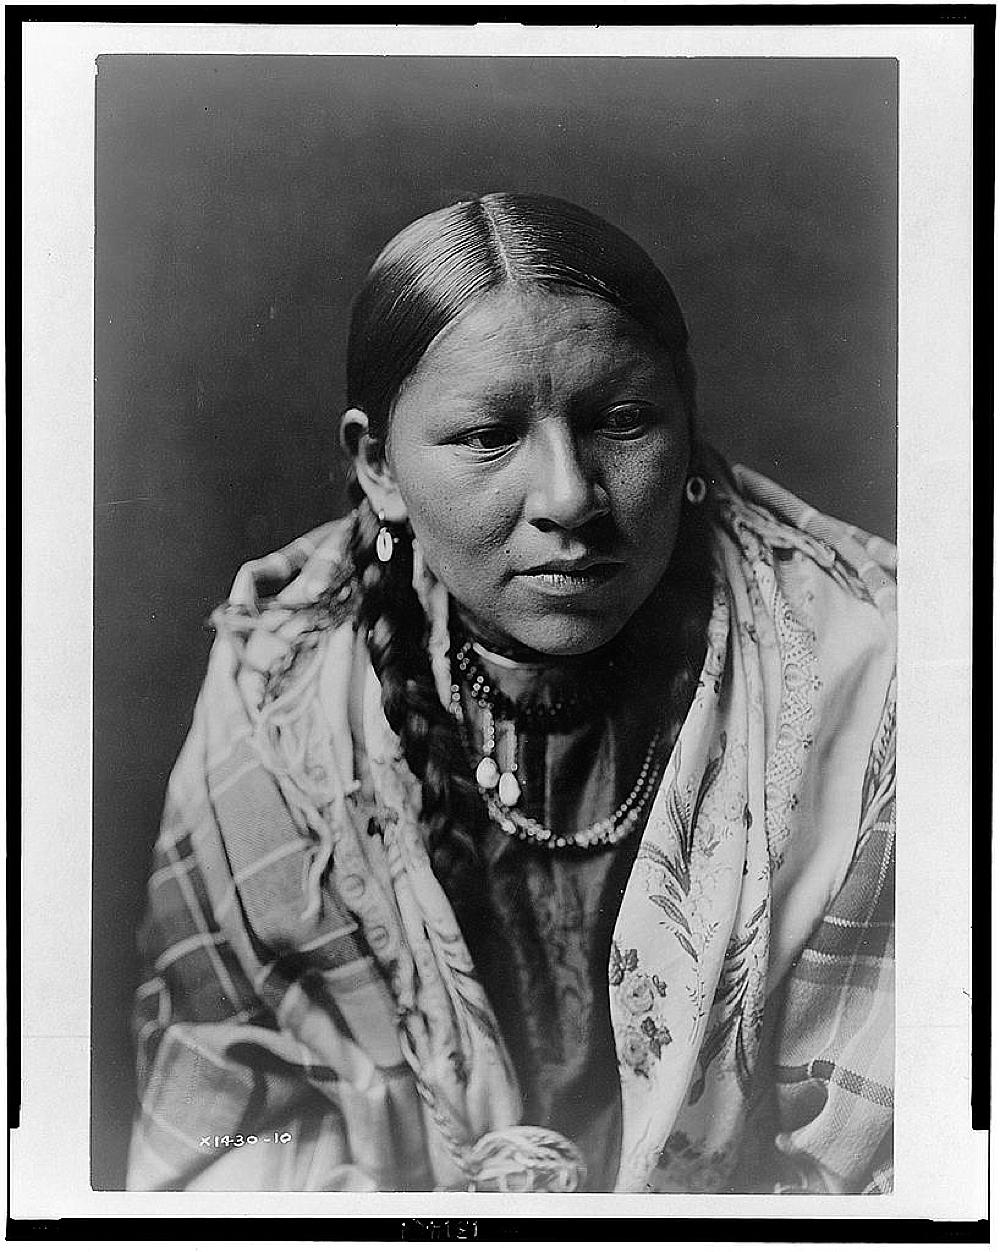 Cheyenne young woman